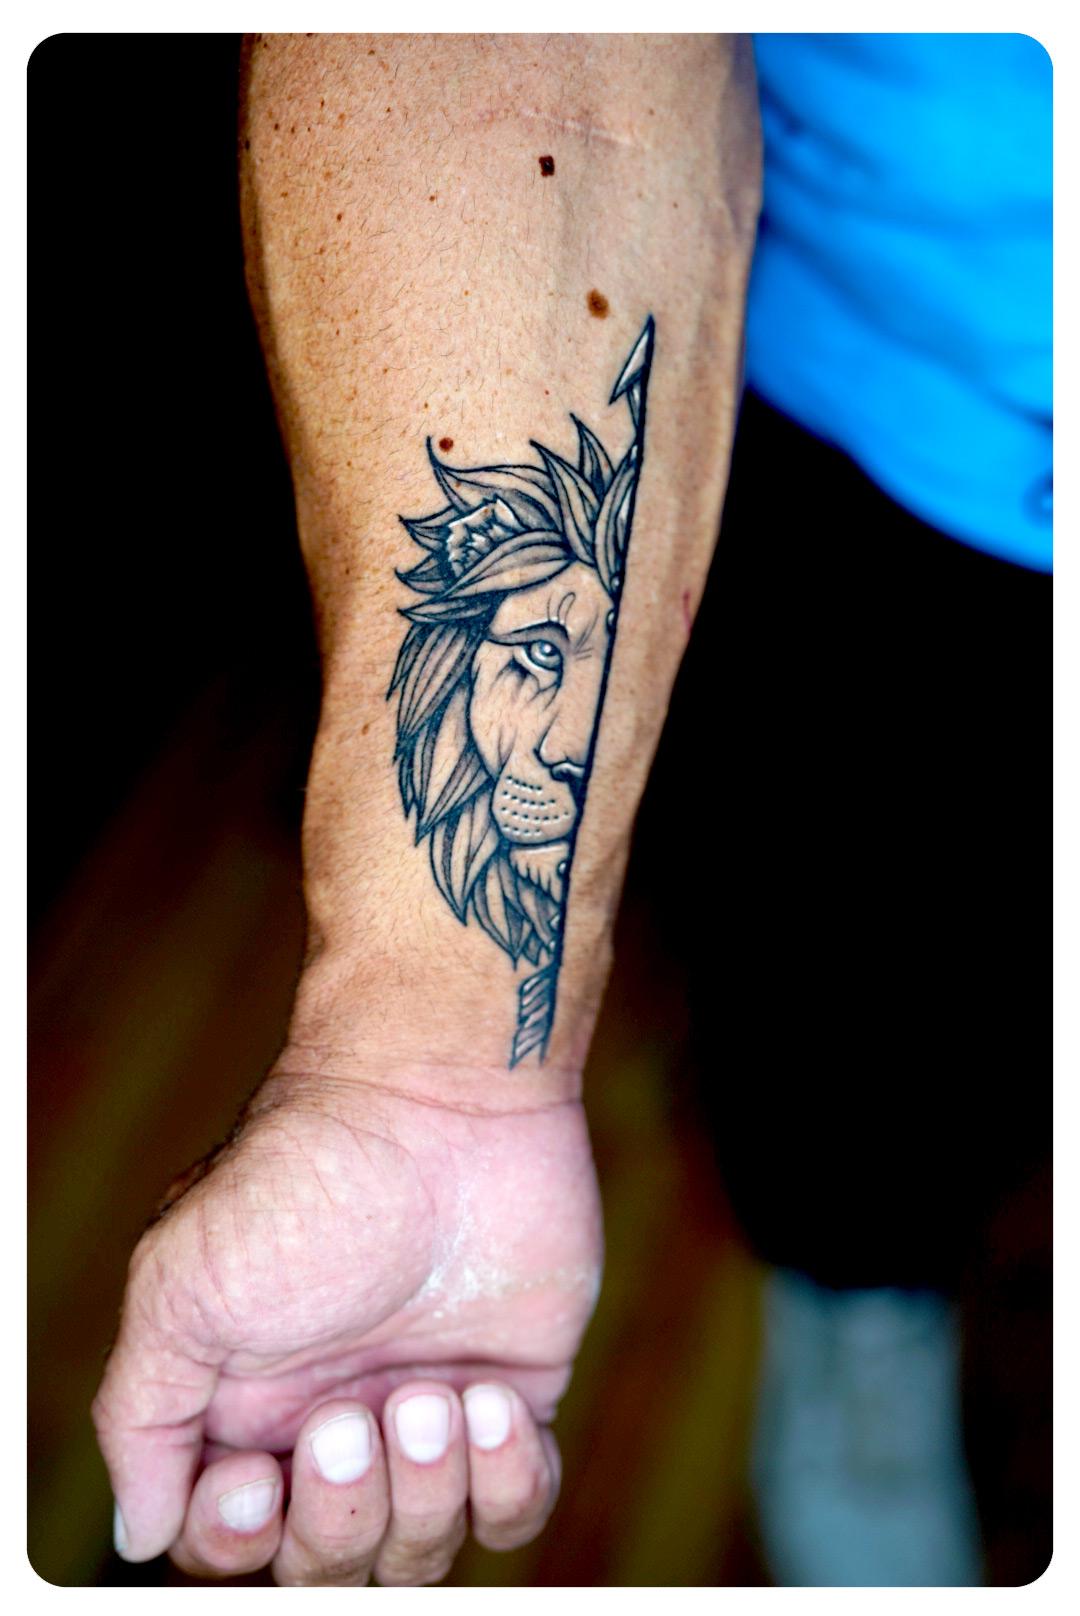 web-2_2019_tattoo_forearm_linework-minimalism_lion-mates.jpg